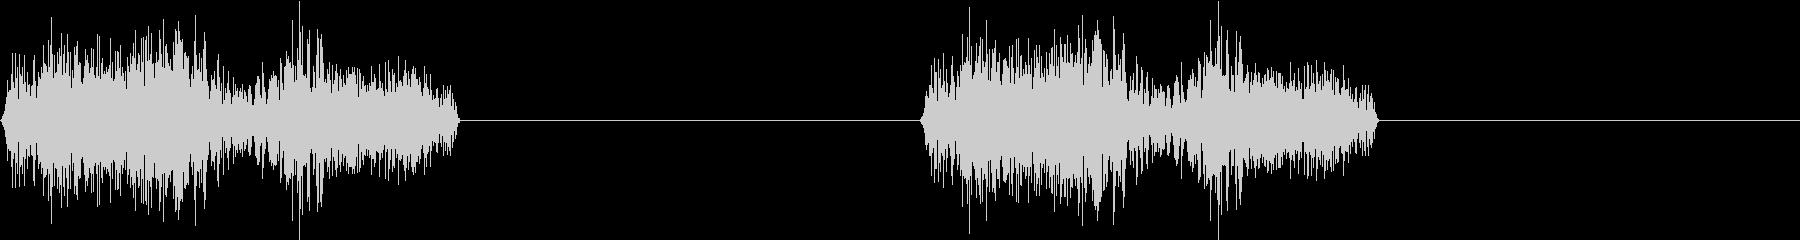 DJプレイ スクラッチ・ノイズ 74の未再生の波形